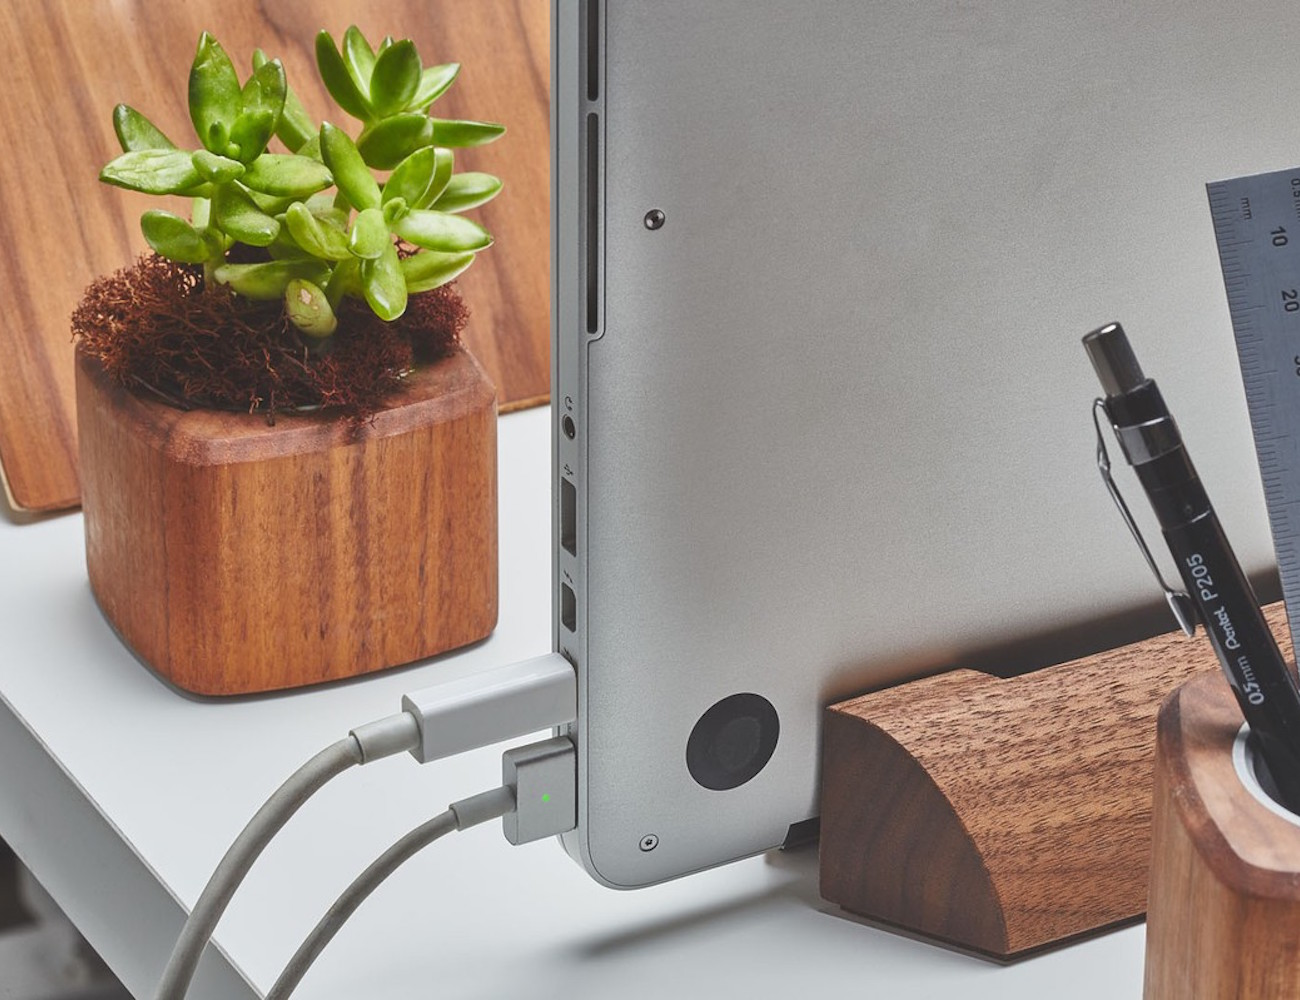 Walnut MacBook Dock by Grovemade